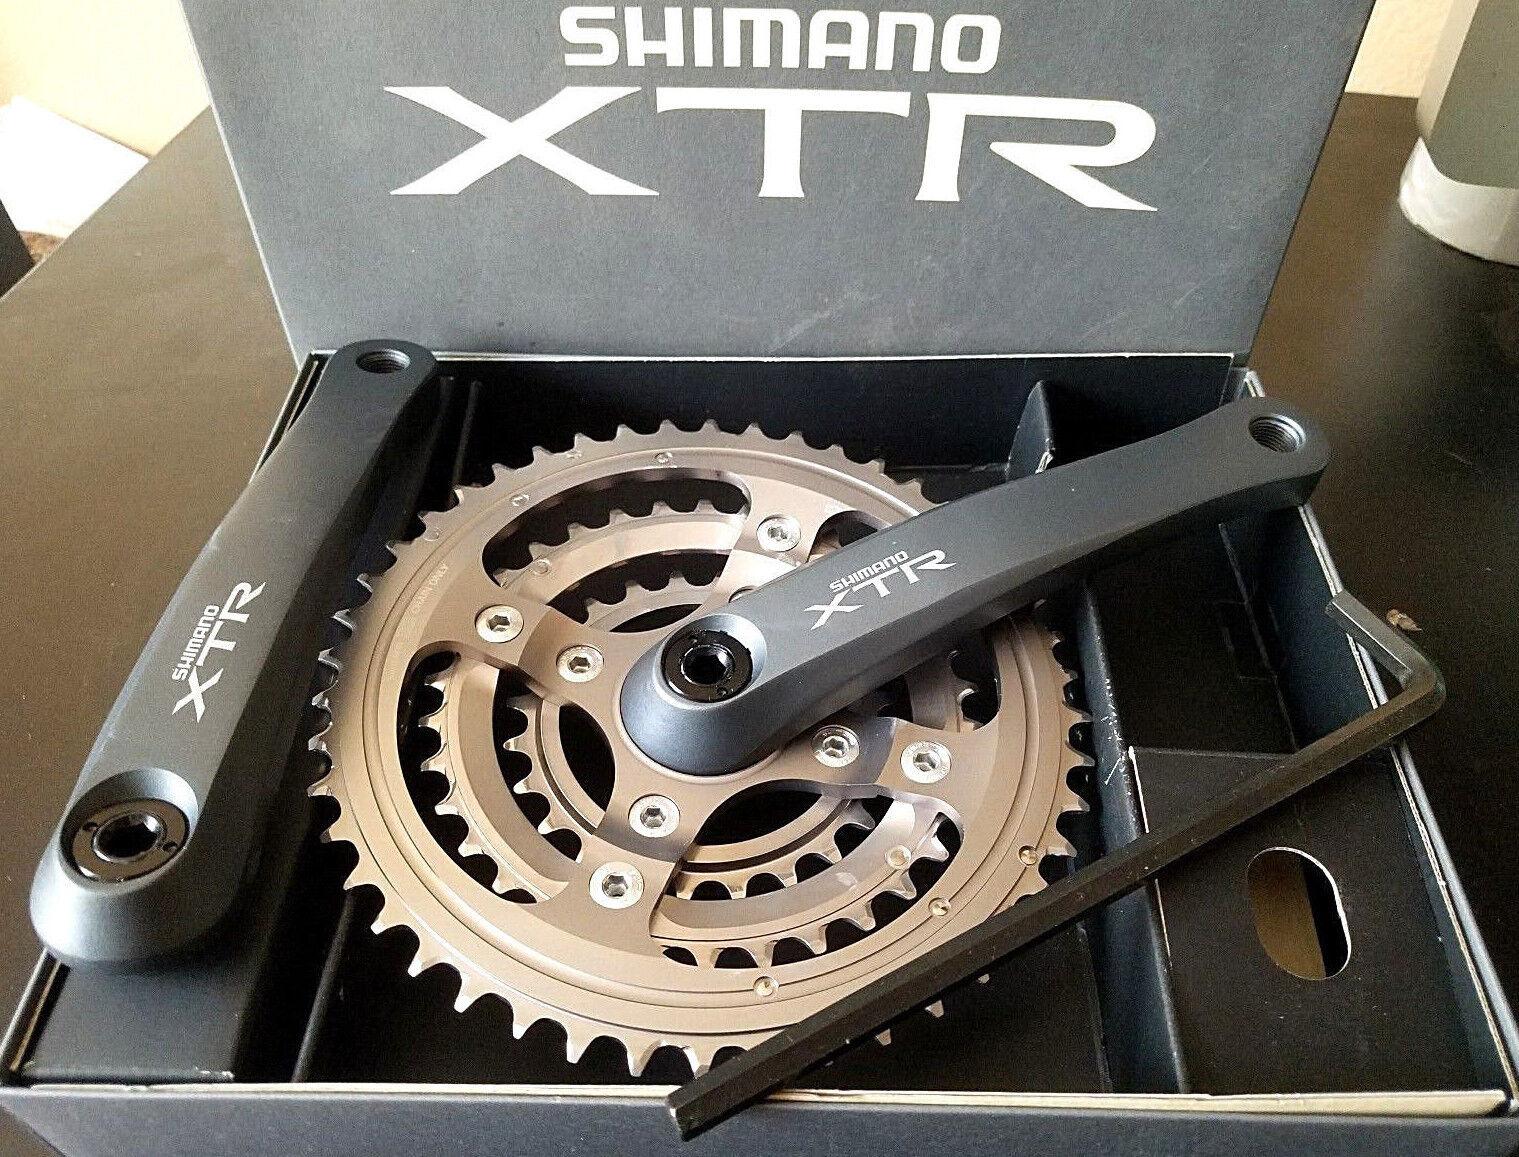 NOS SHIMANO XTR FC M950 4-ARM CRANKSET 170MM MTN BIKE CRANK 46 34 24 RARE NIB